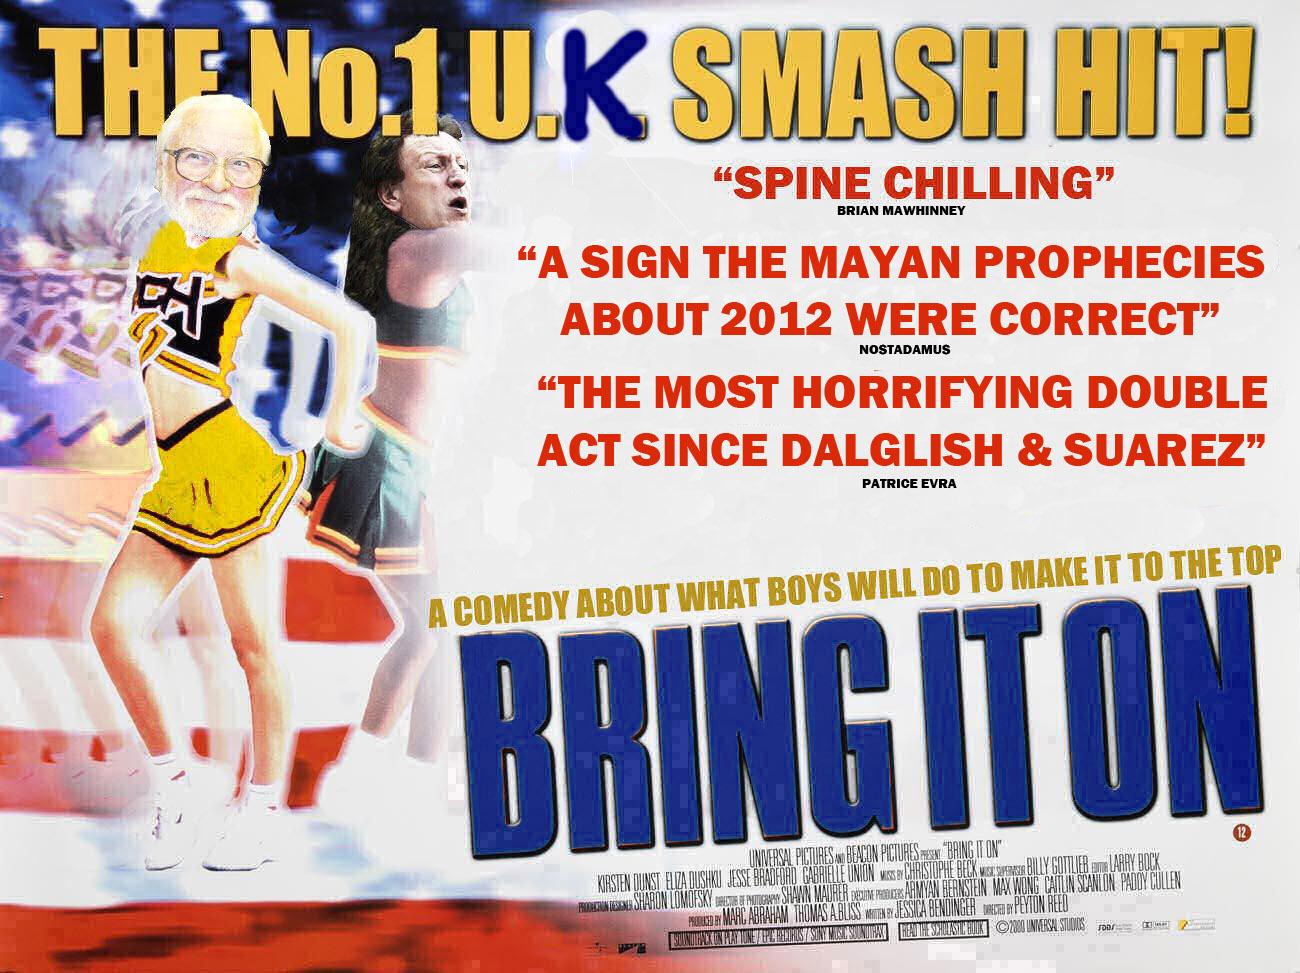 Mash movie poster